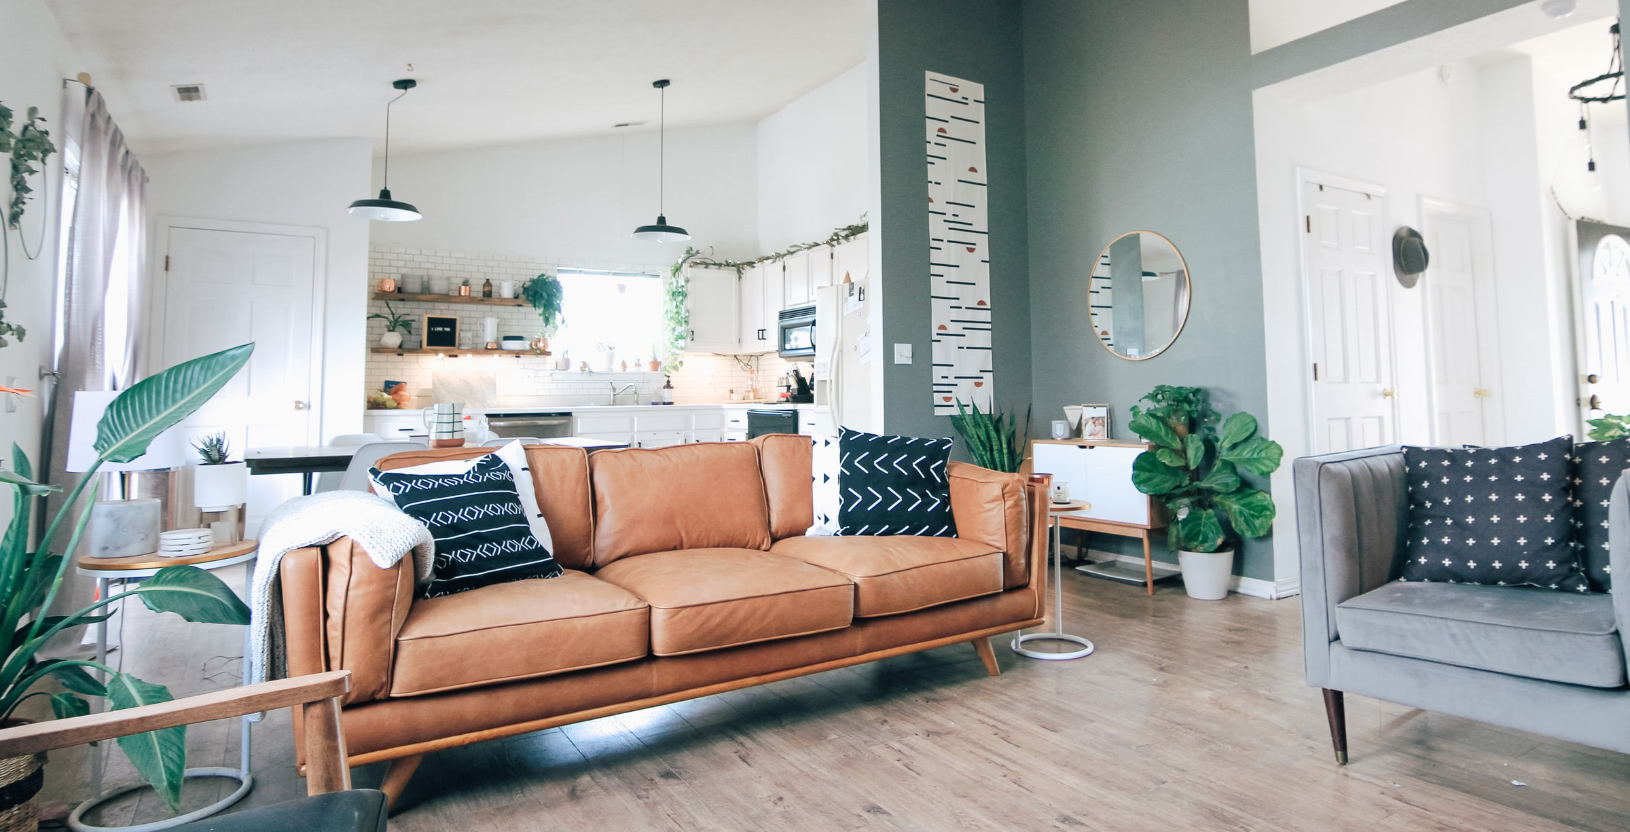 A modern, mid-century inspired, living room